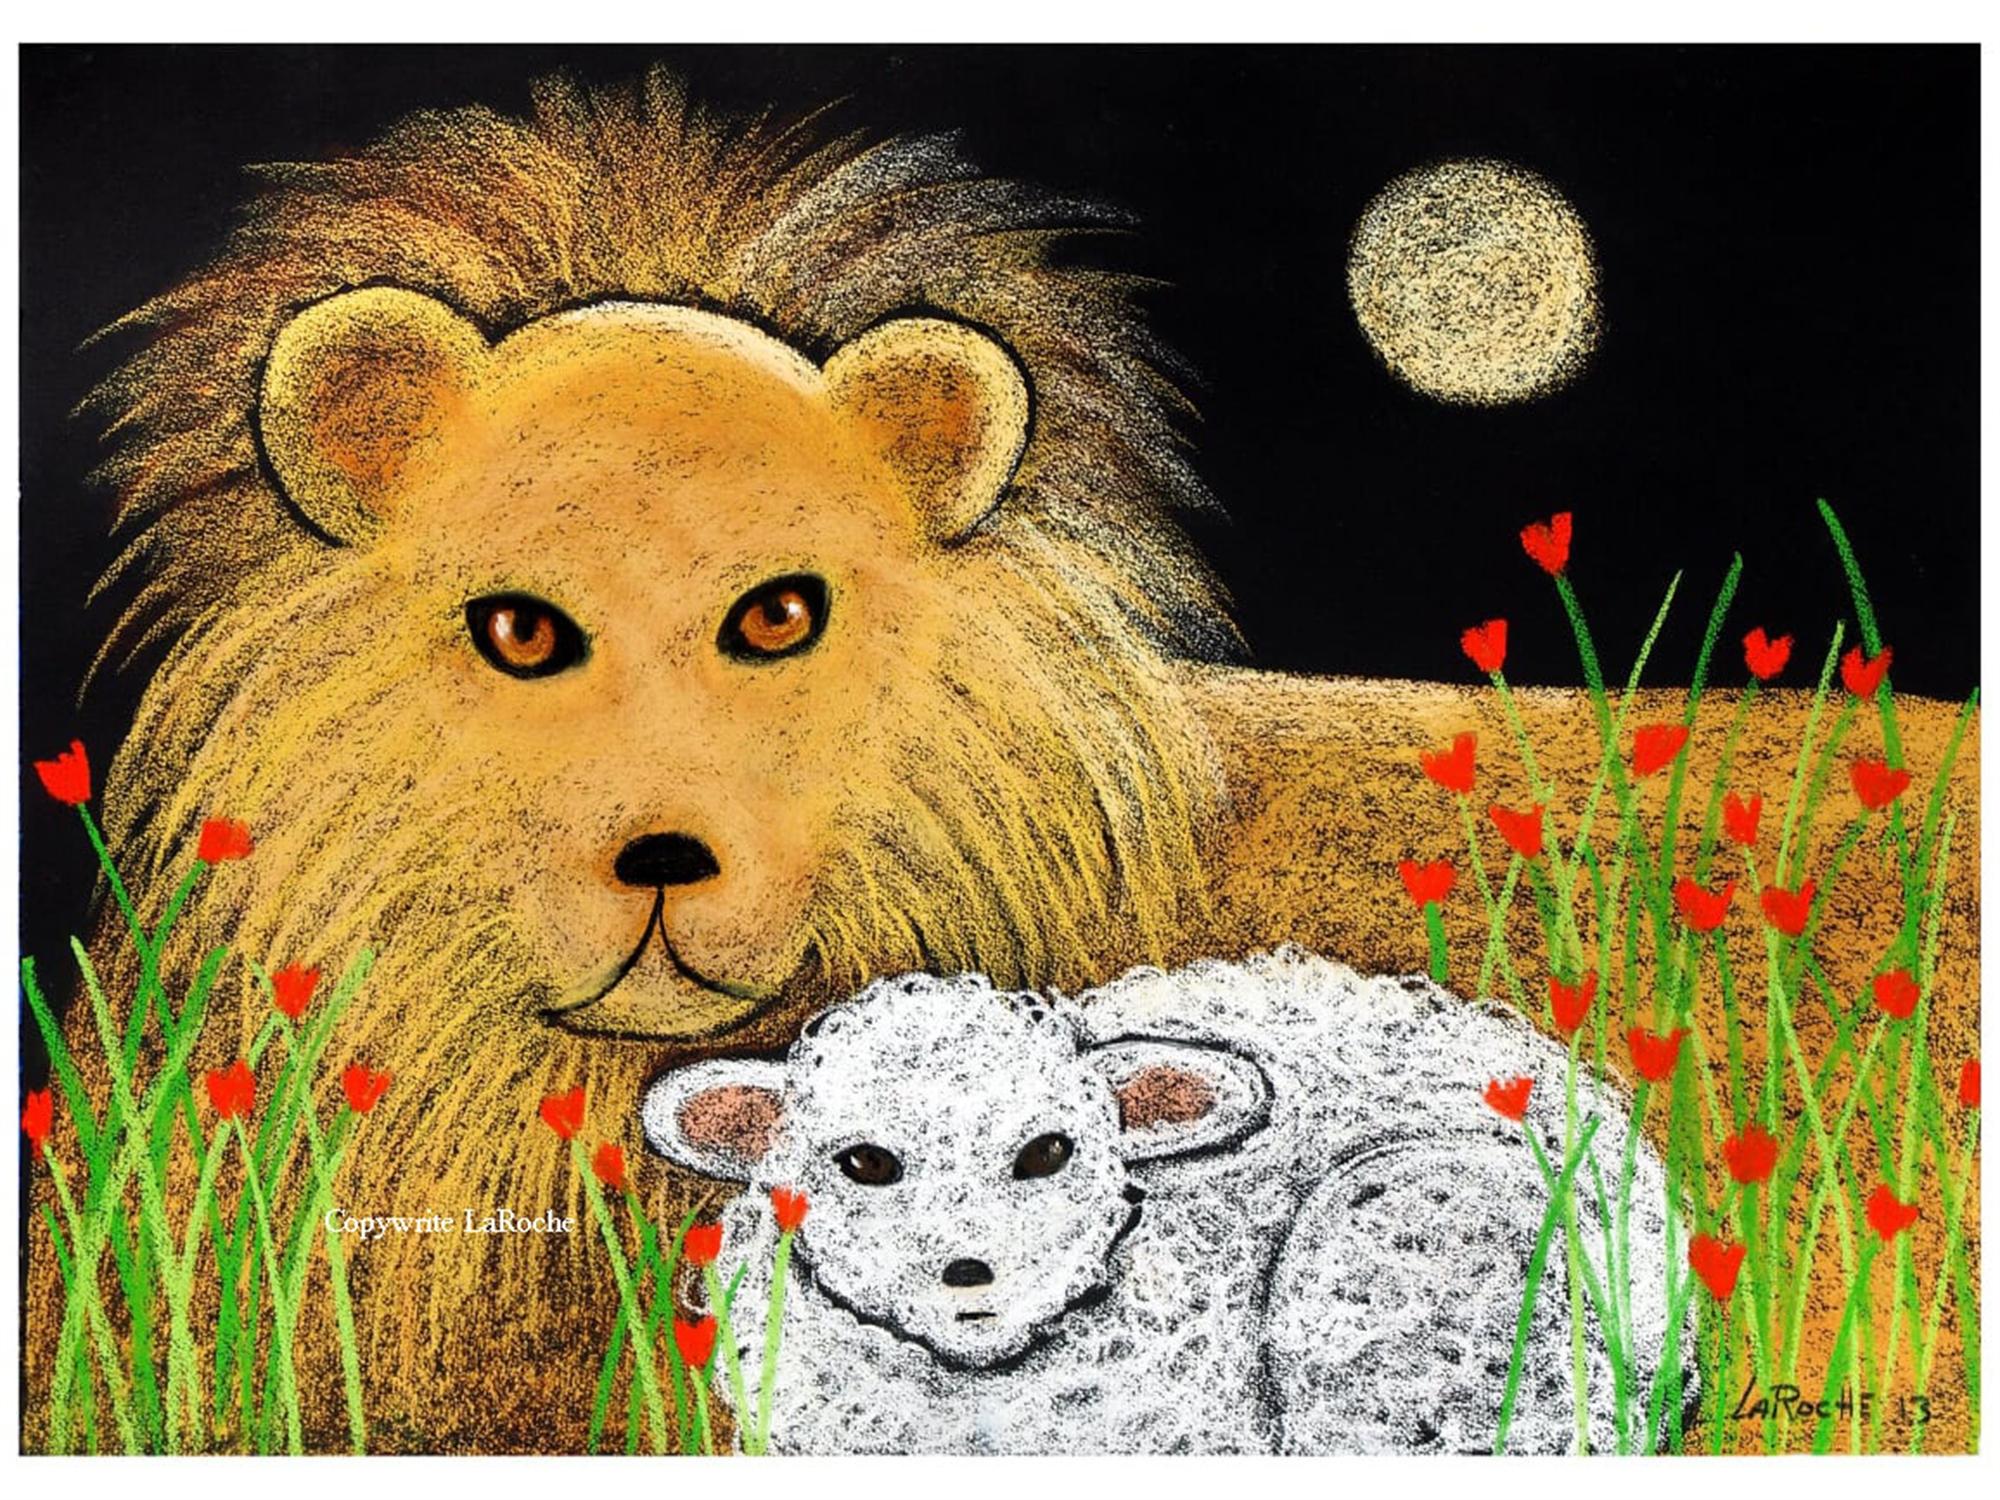 LION AND LAMB by Carole LaRoche